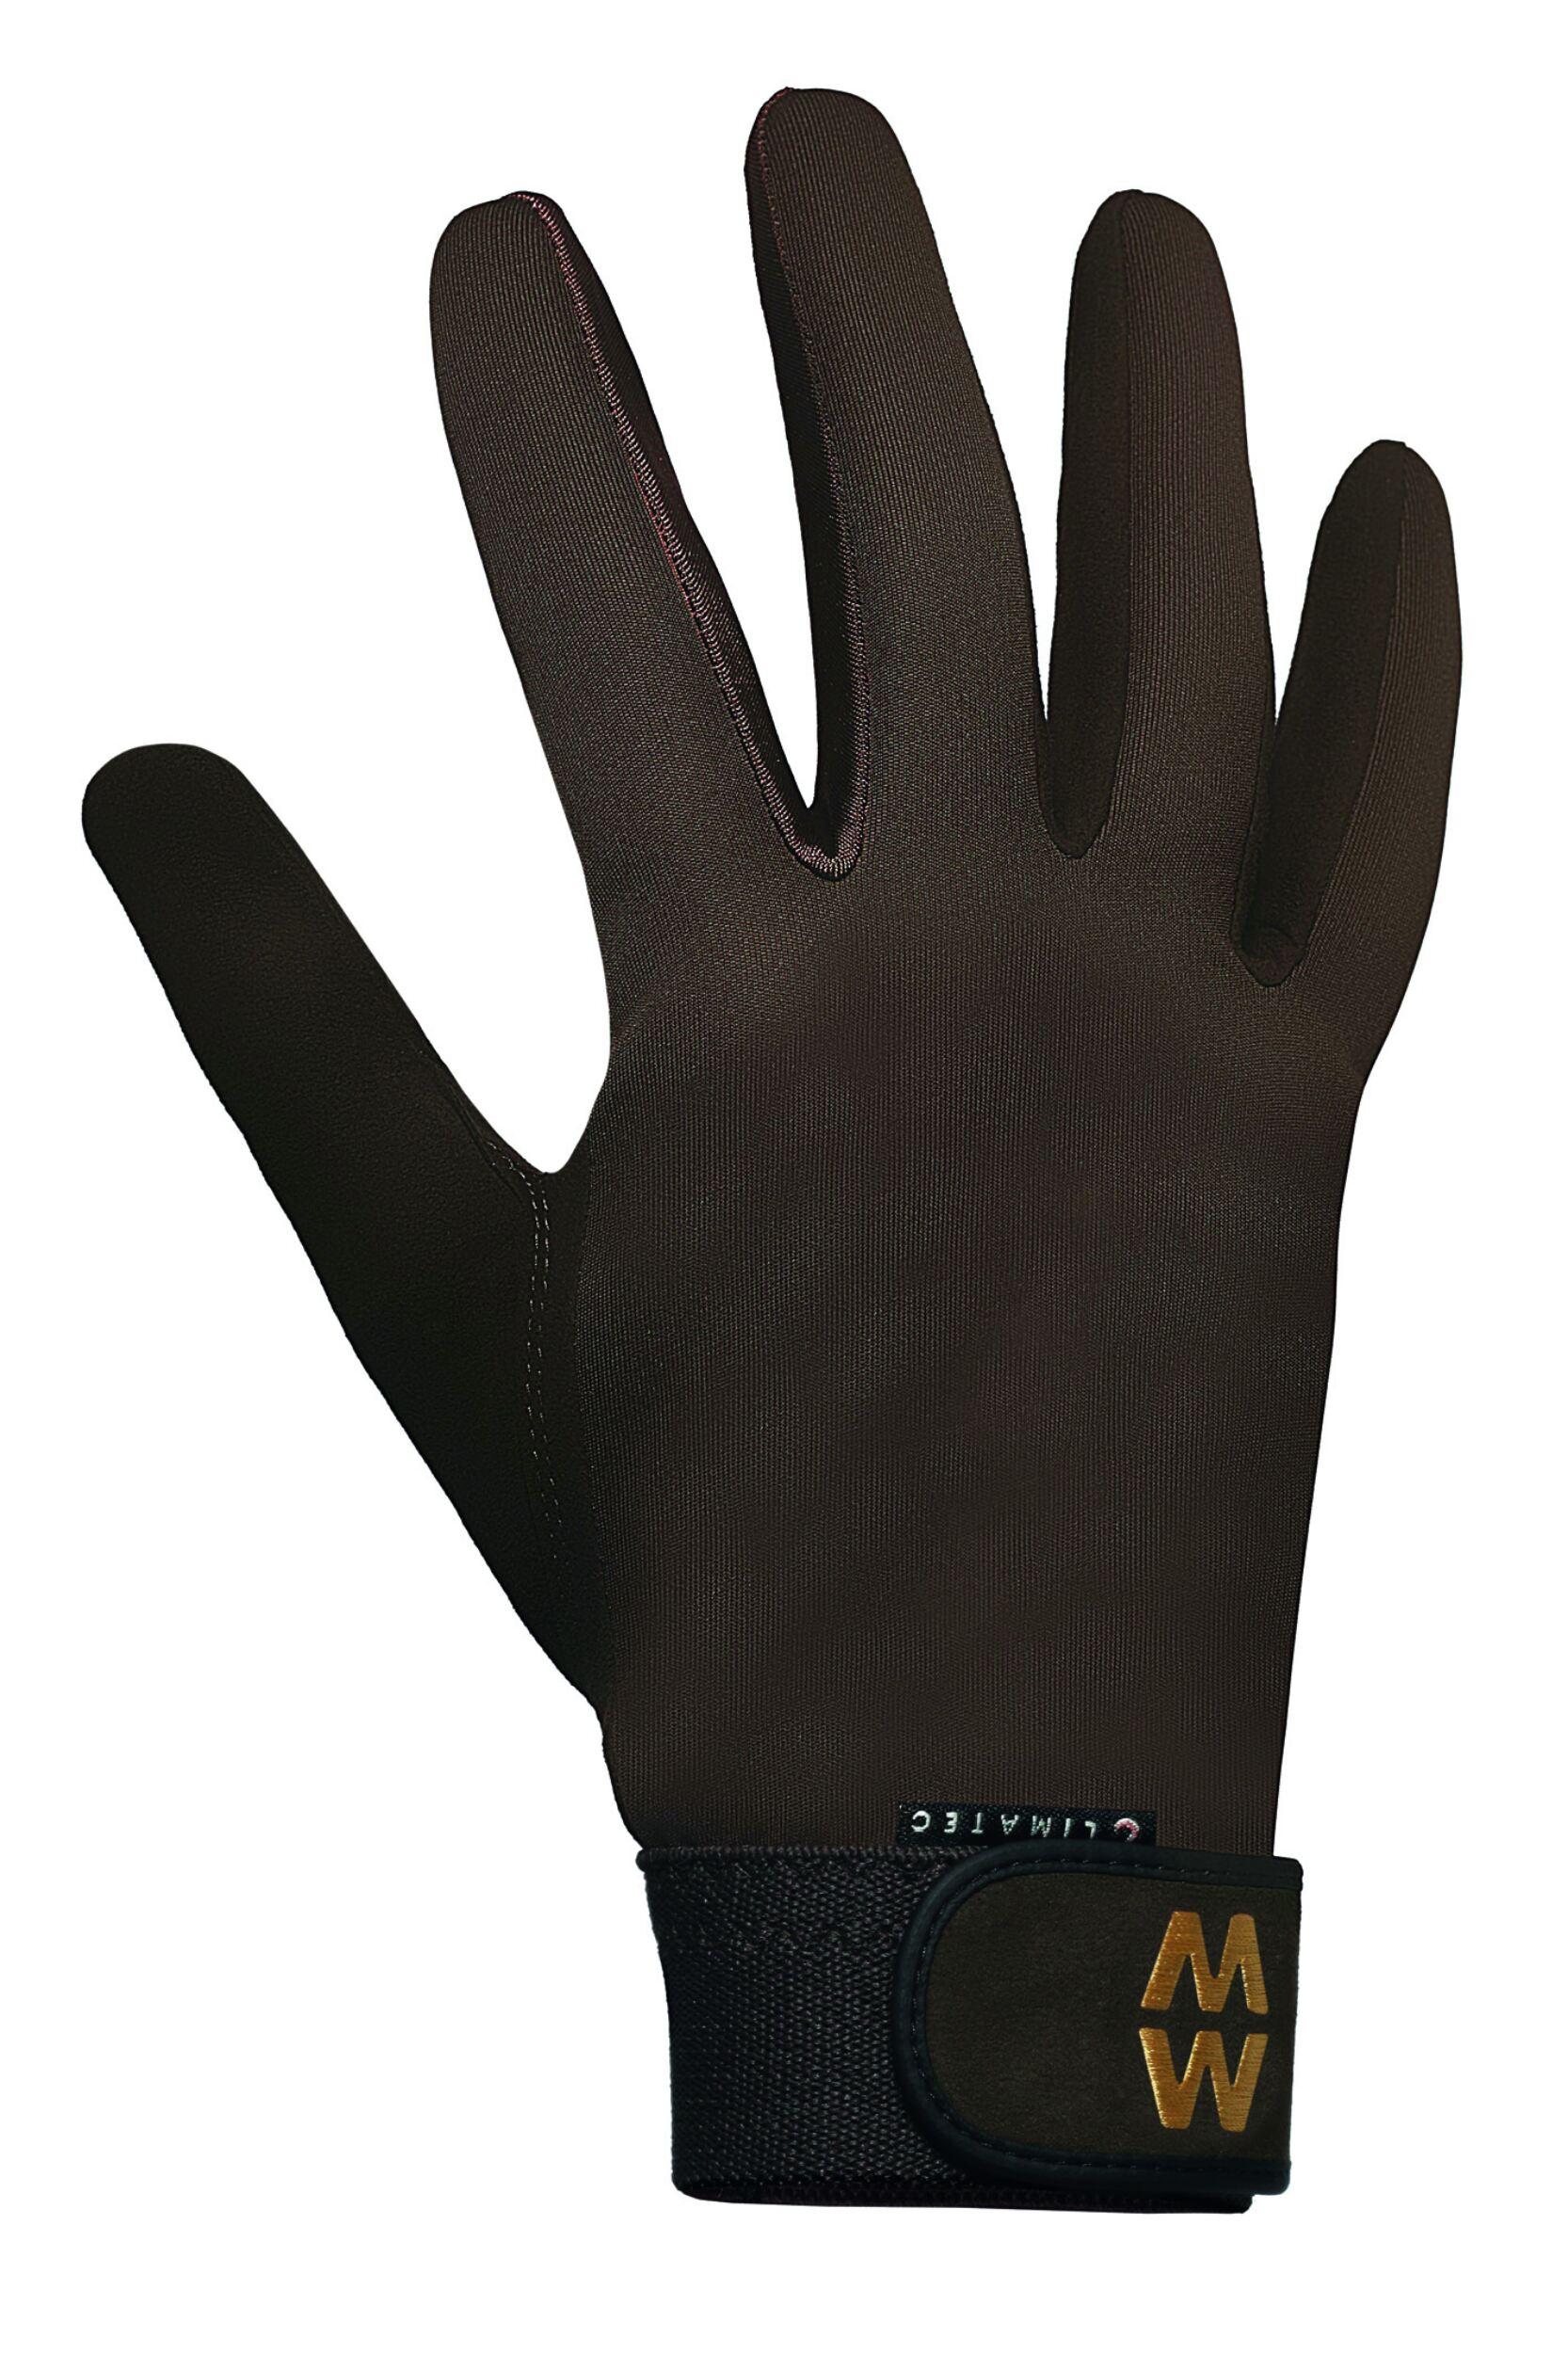 Mens-amp-Ladies-1-Pair-MacWet-Long-Climatec-Sports-Gloves thumbnail 4